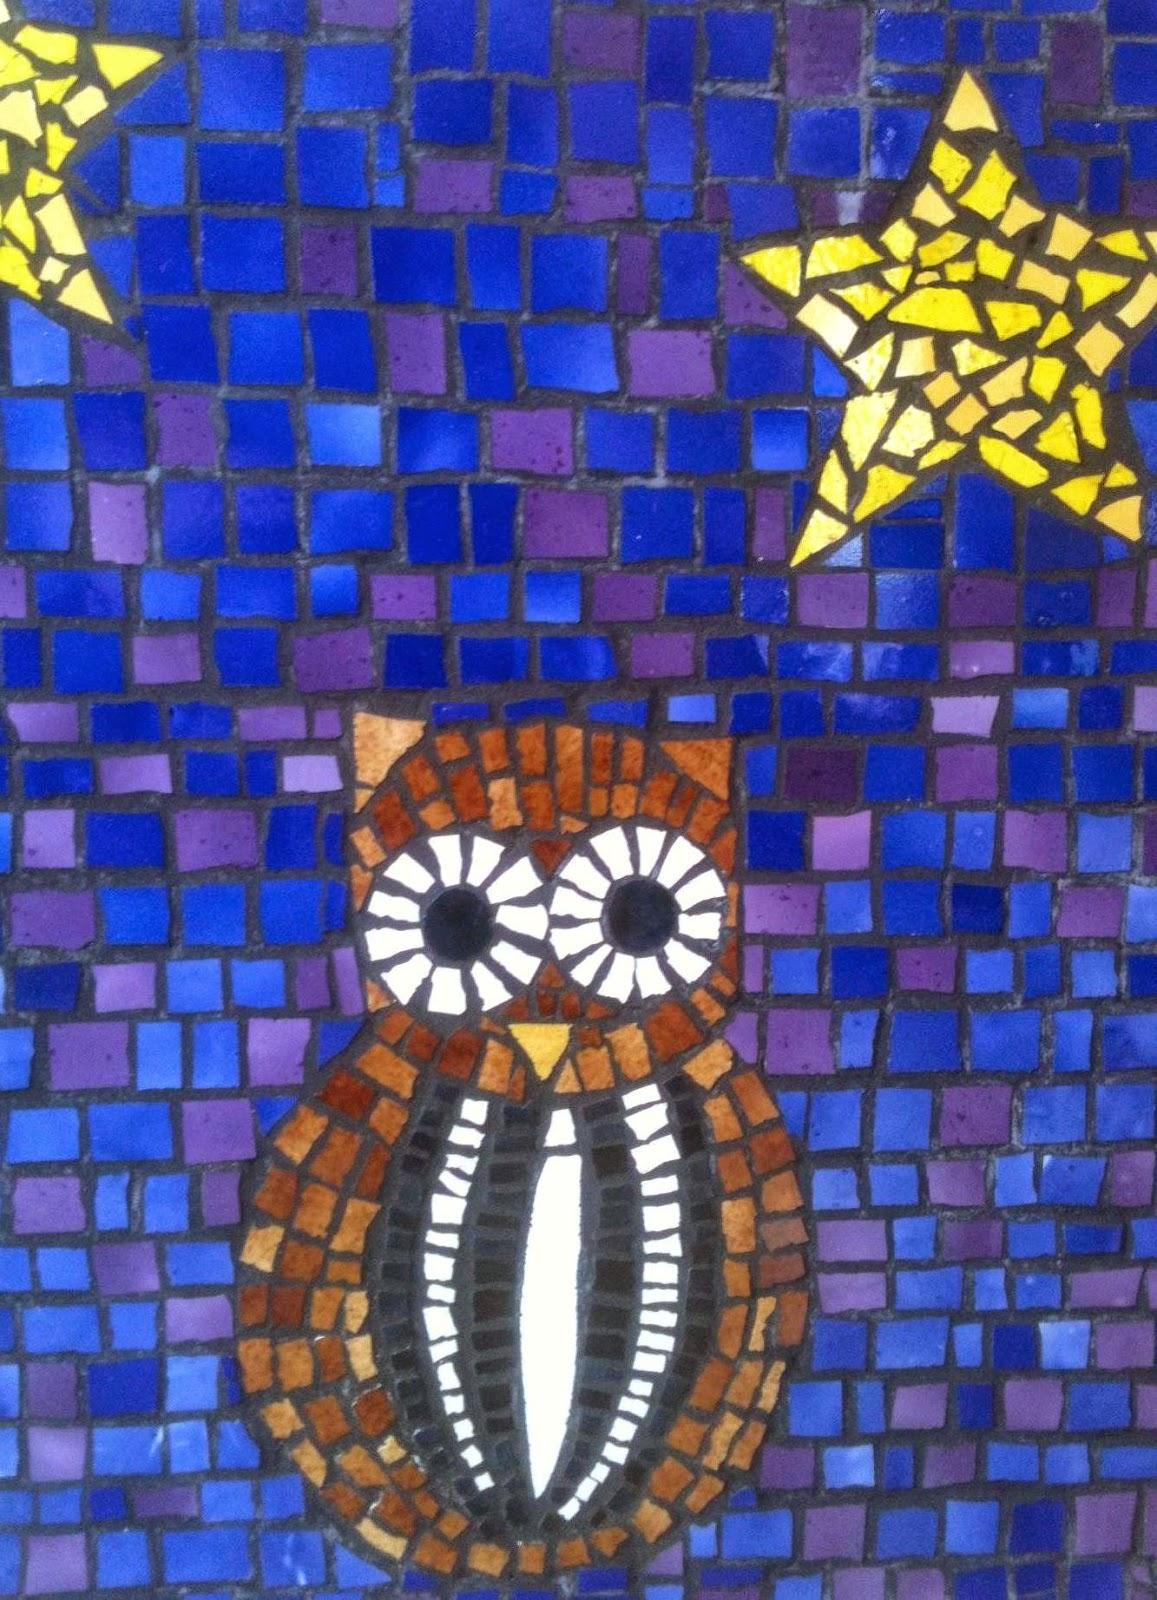 Taller de montevideo cursos de mosaicos para adultos y ni os - Dibujos de pared para ninos ...